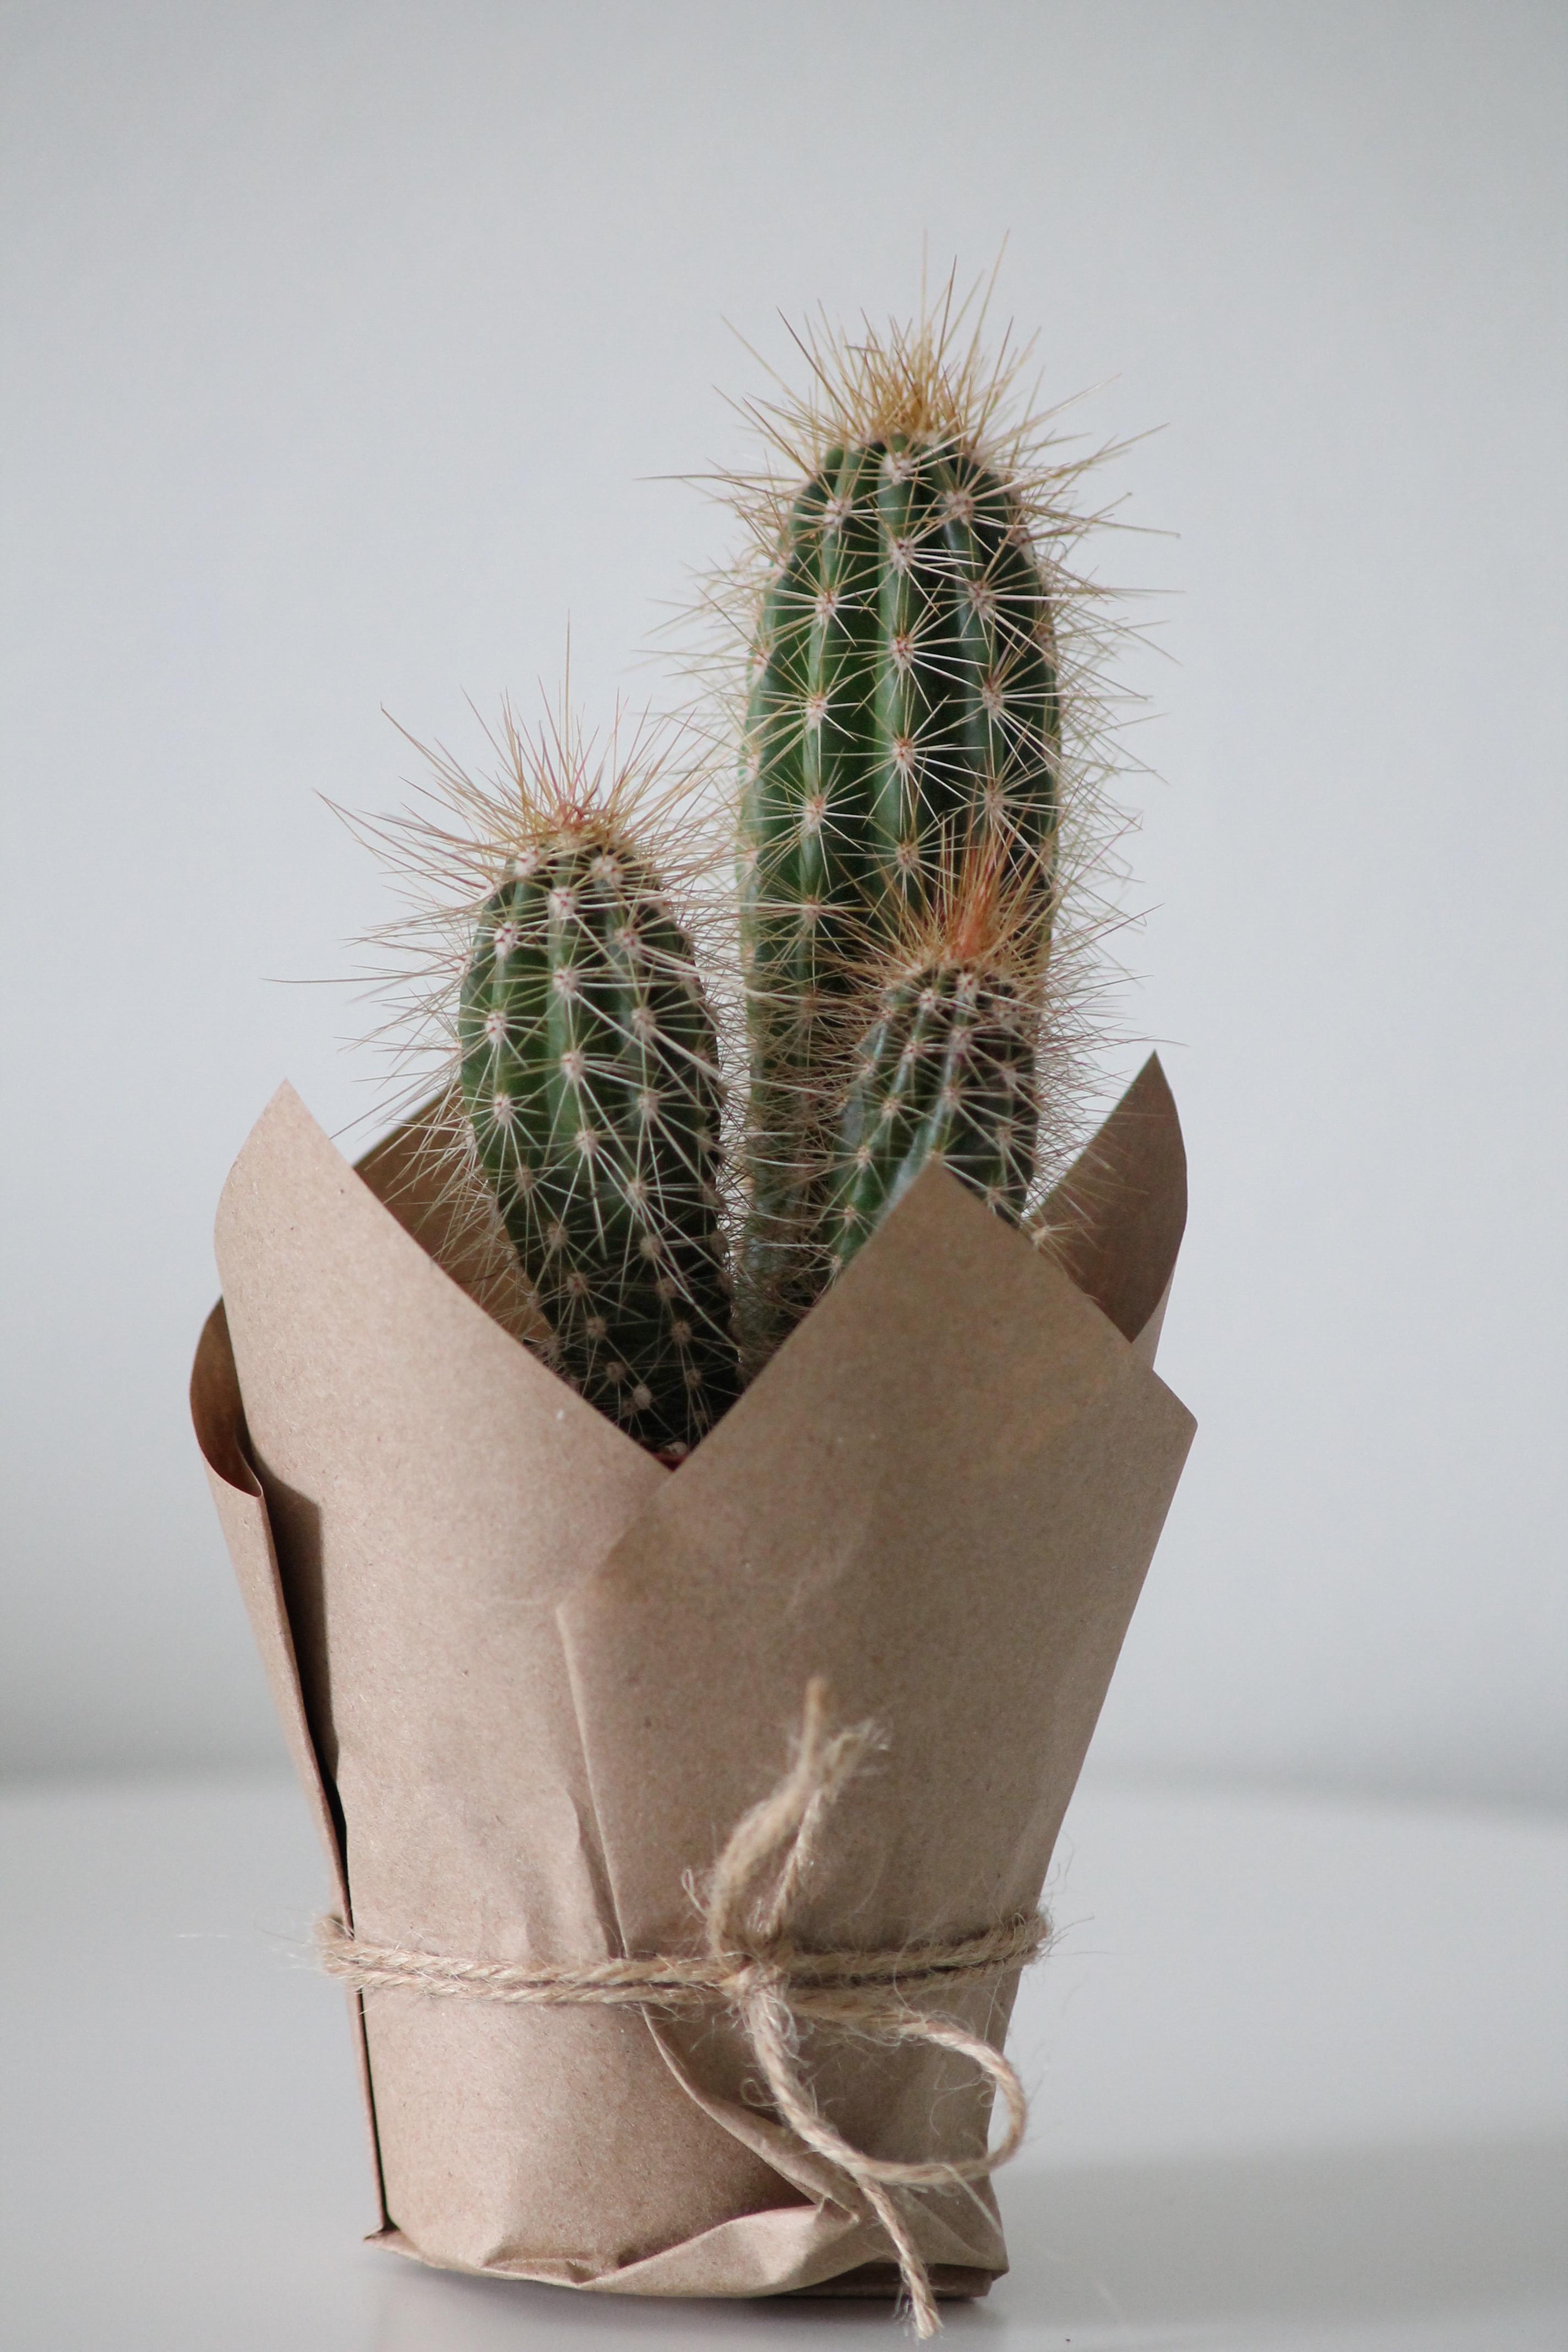 Polaskia Chichipe Office Plants